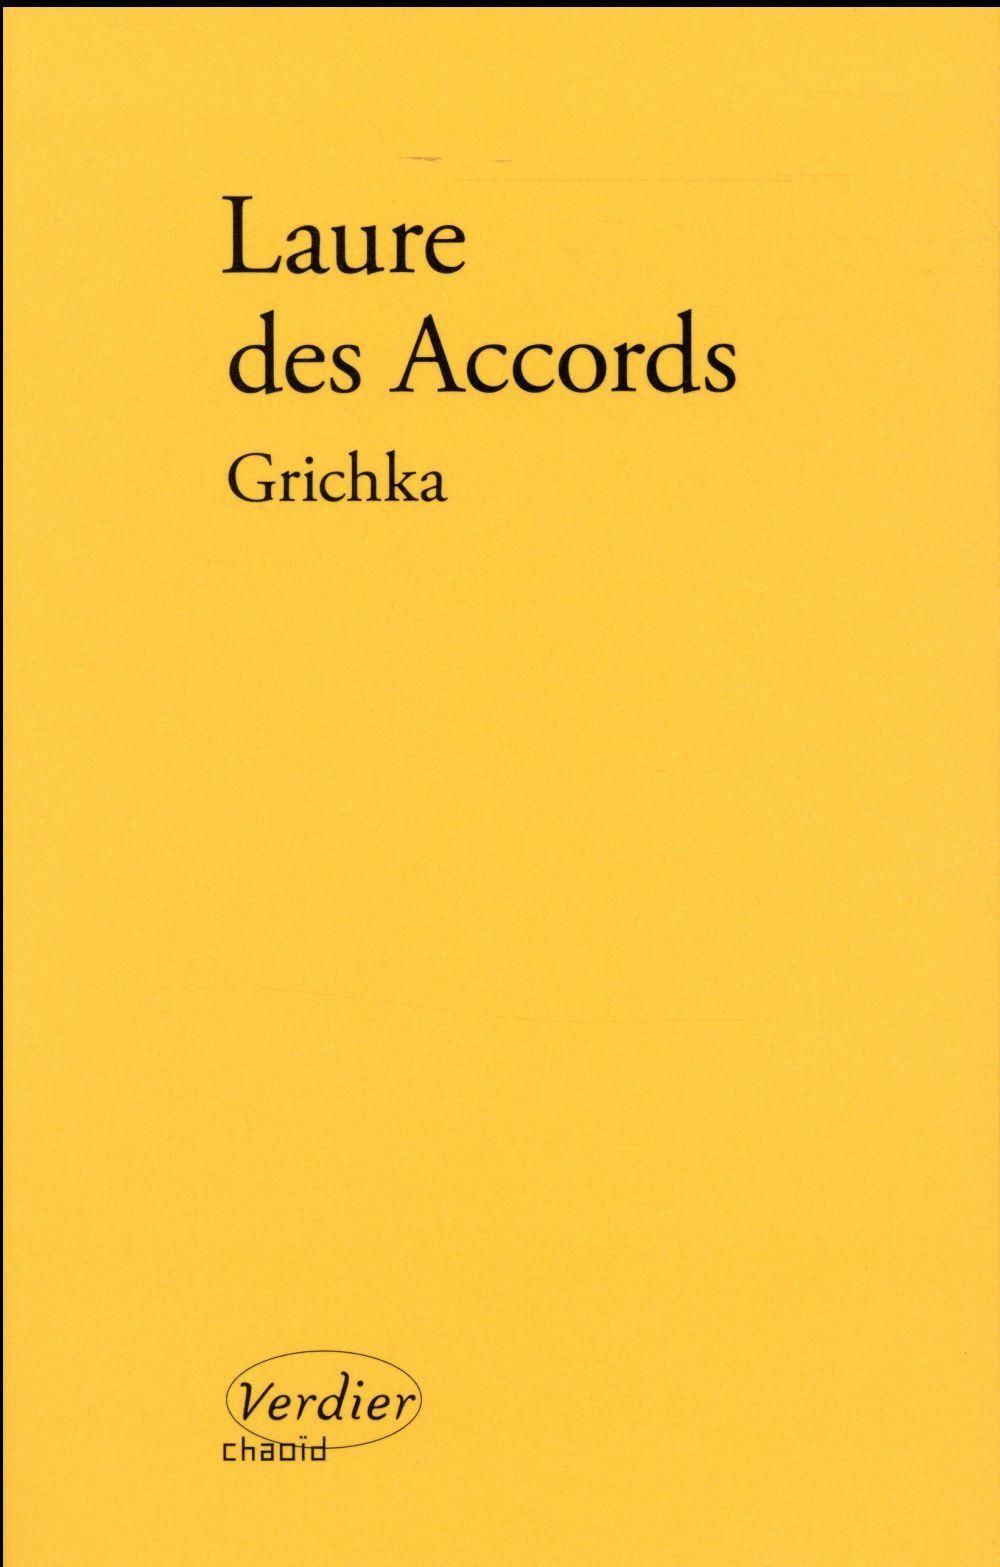 Grichka